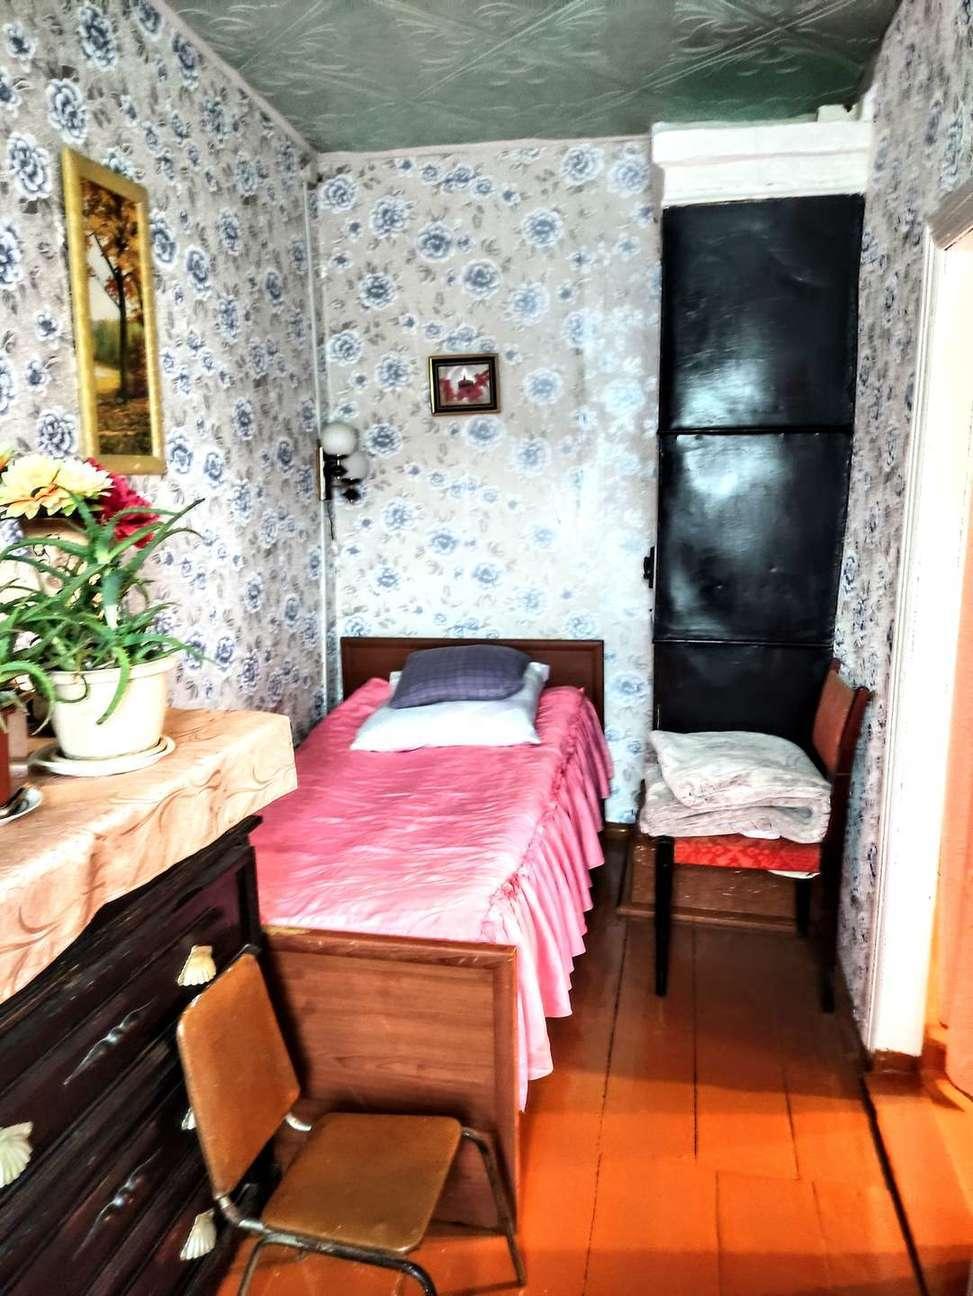 Продажа дома, 56м <sup>2</sup>, 700 сот., Сызрань, Угловая 1-я улица,  дом 2